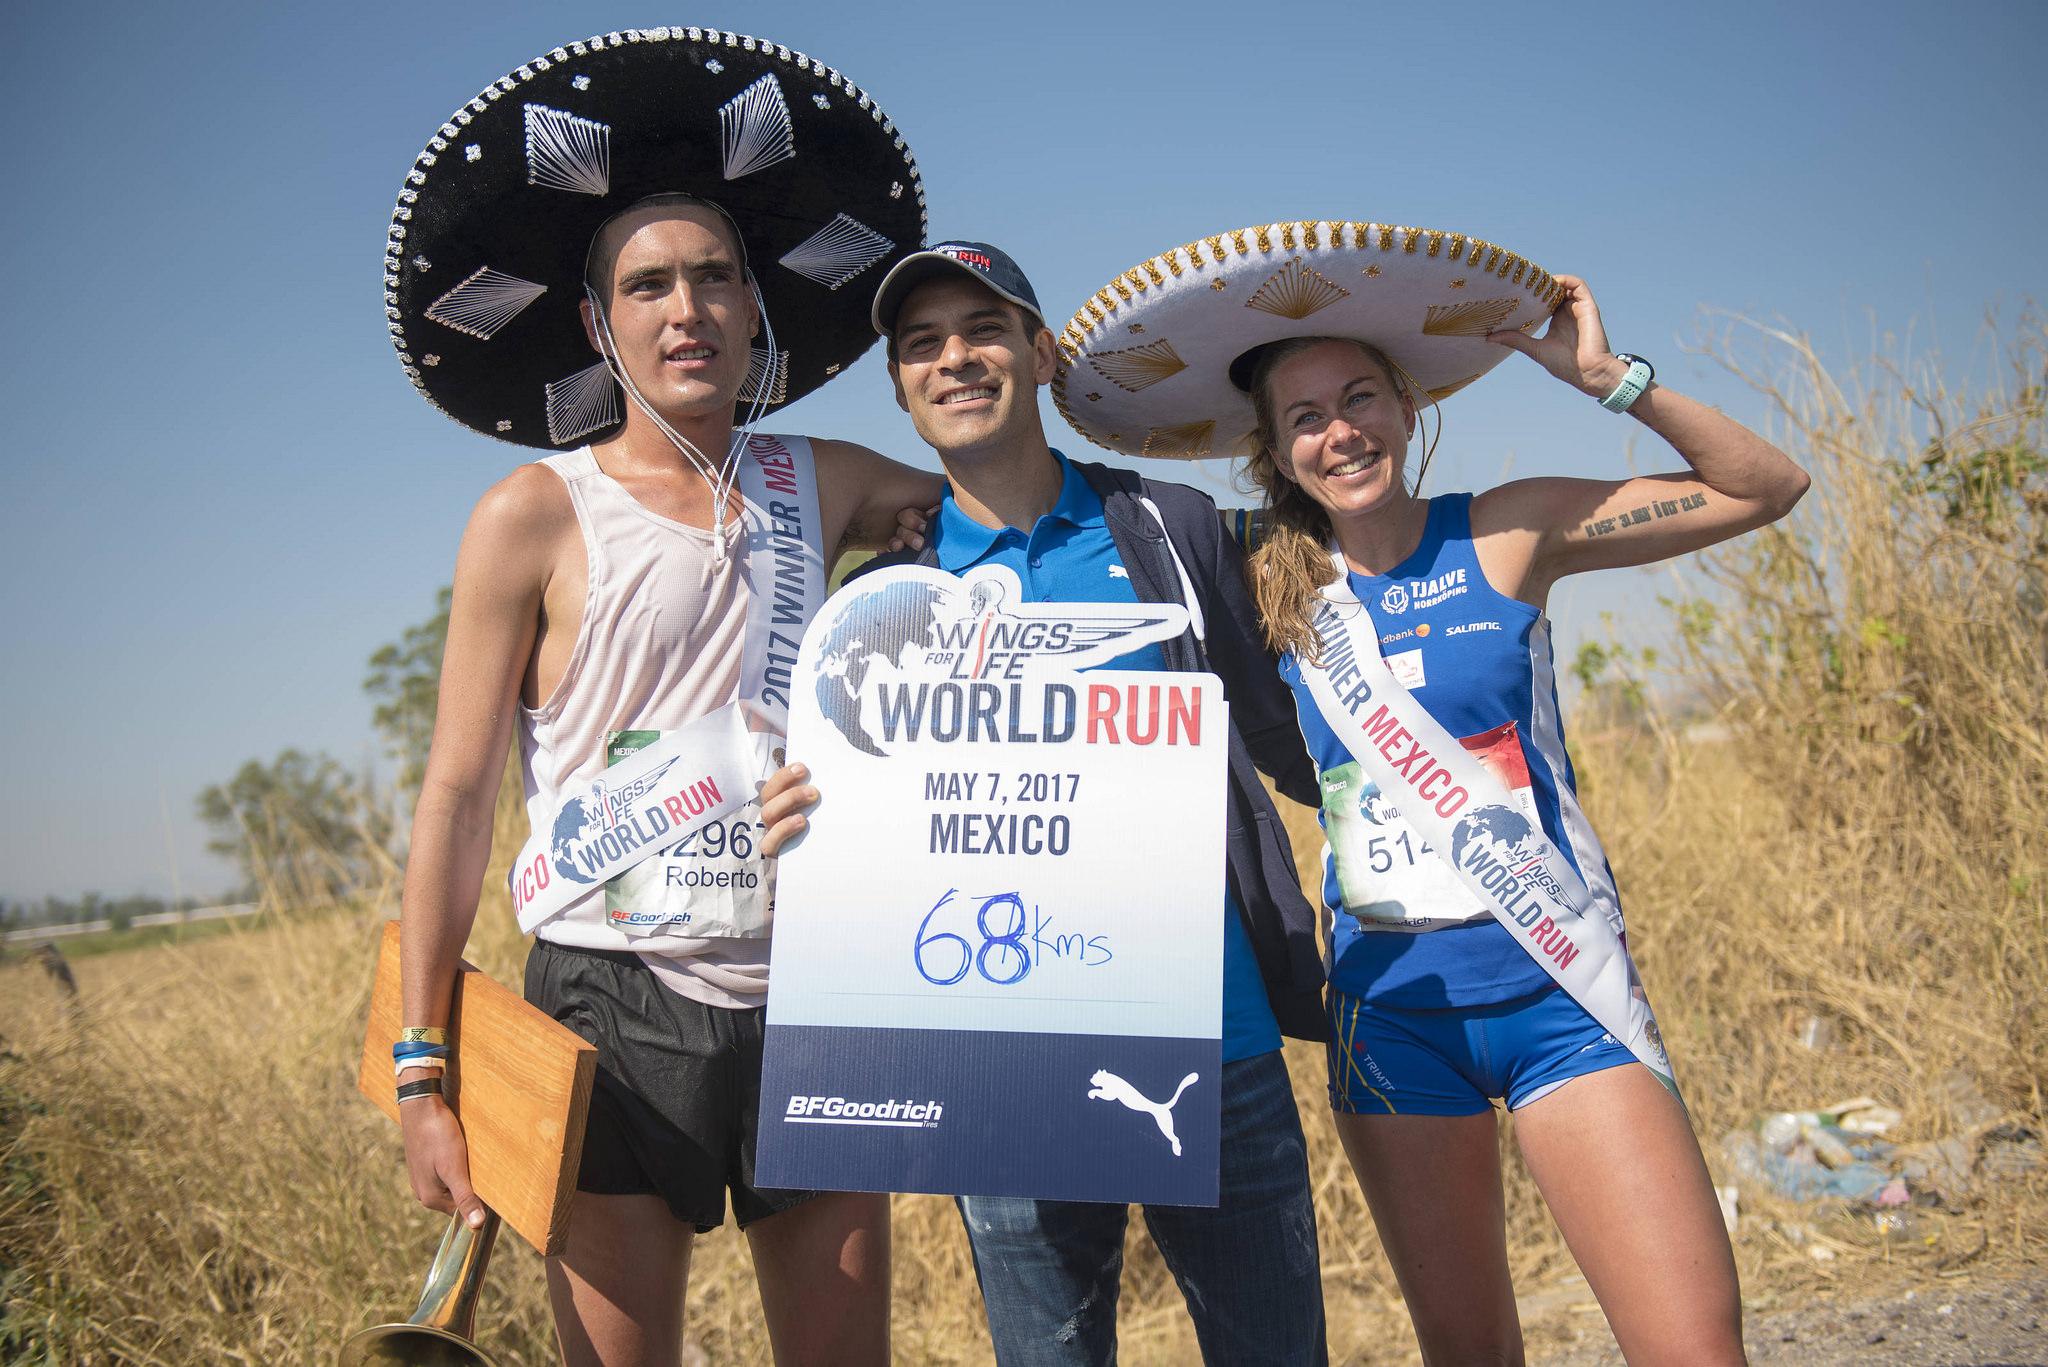 wings for life world run mexico guadalajara monterrey 2018